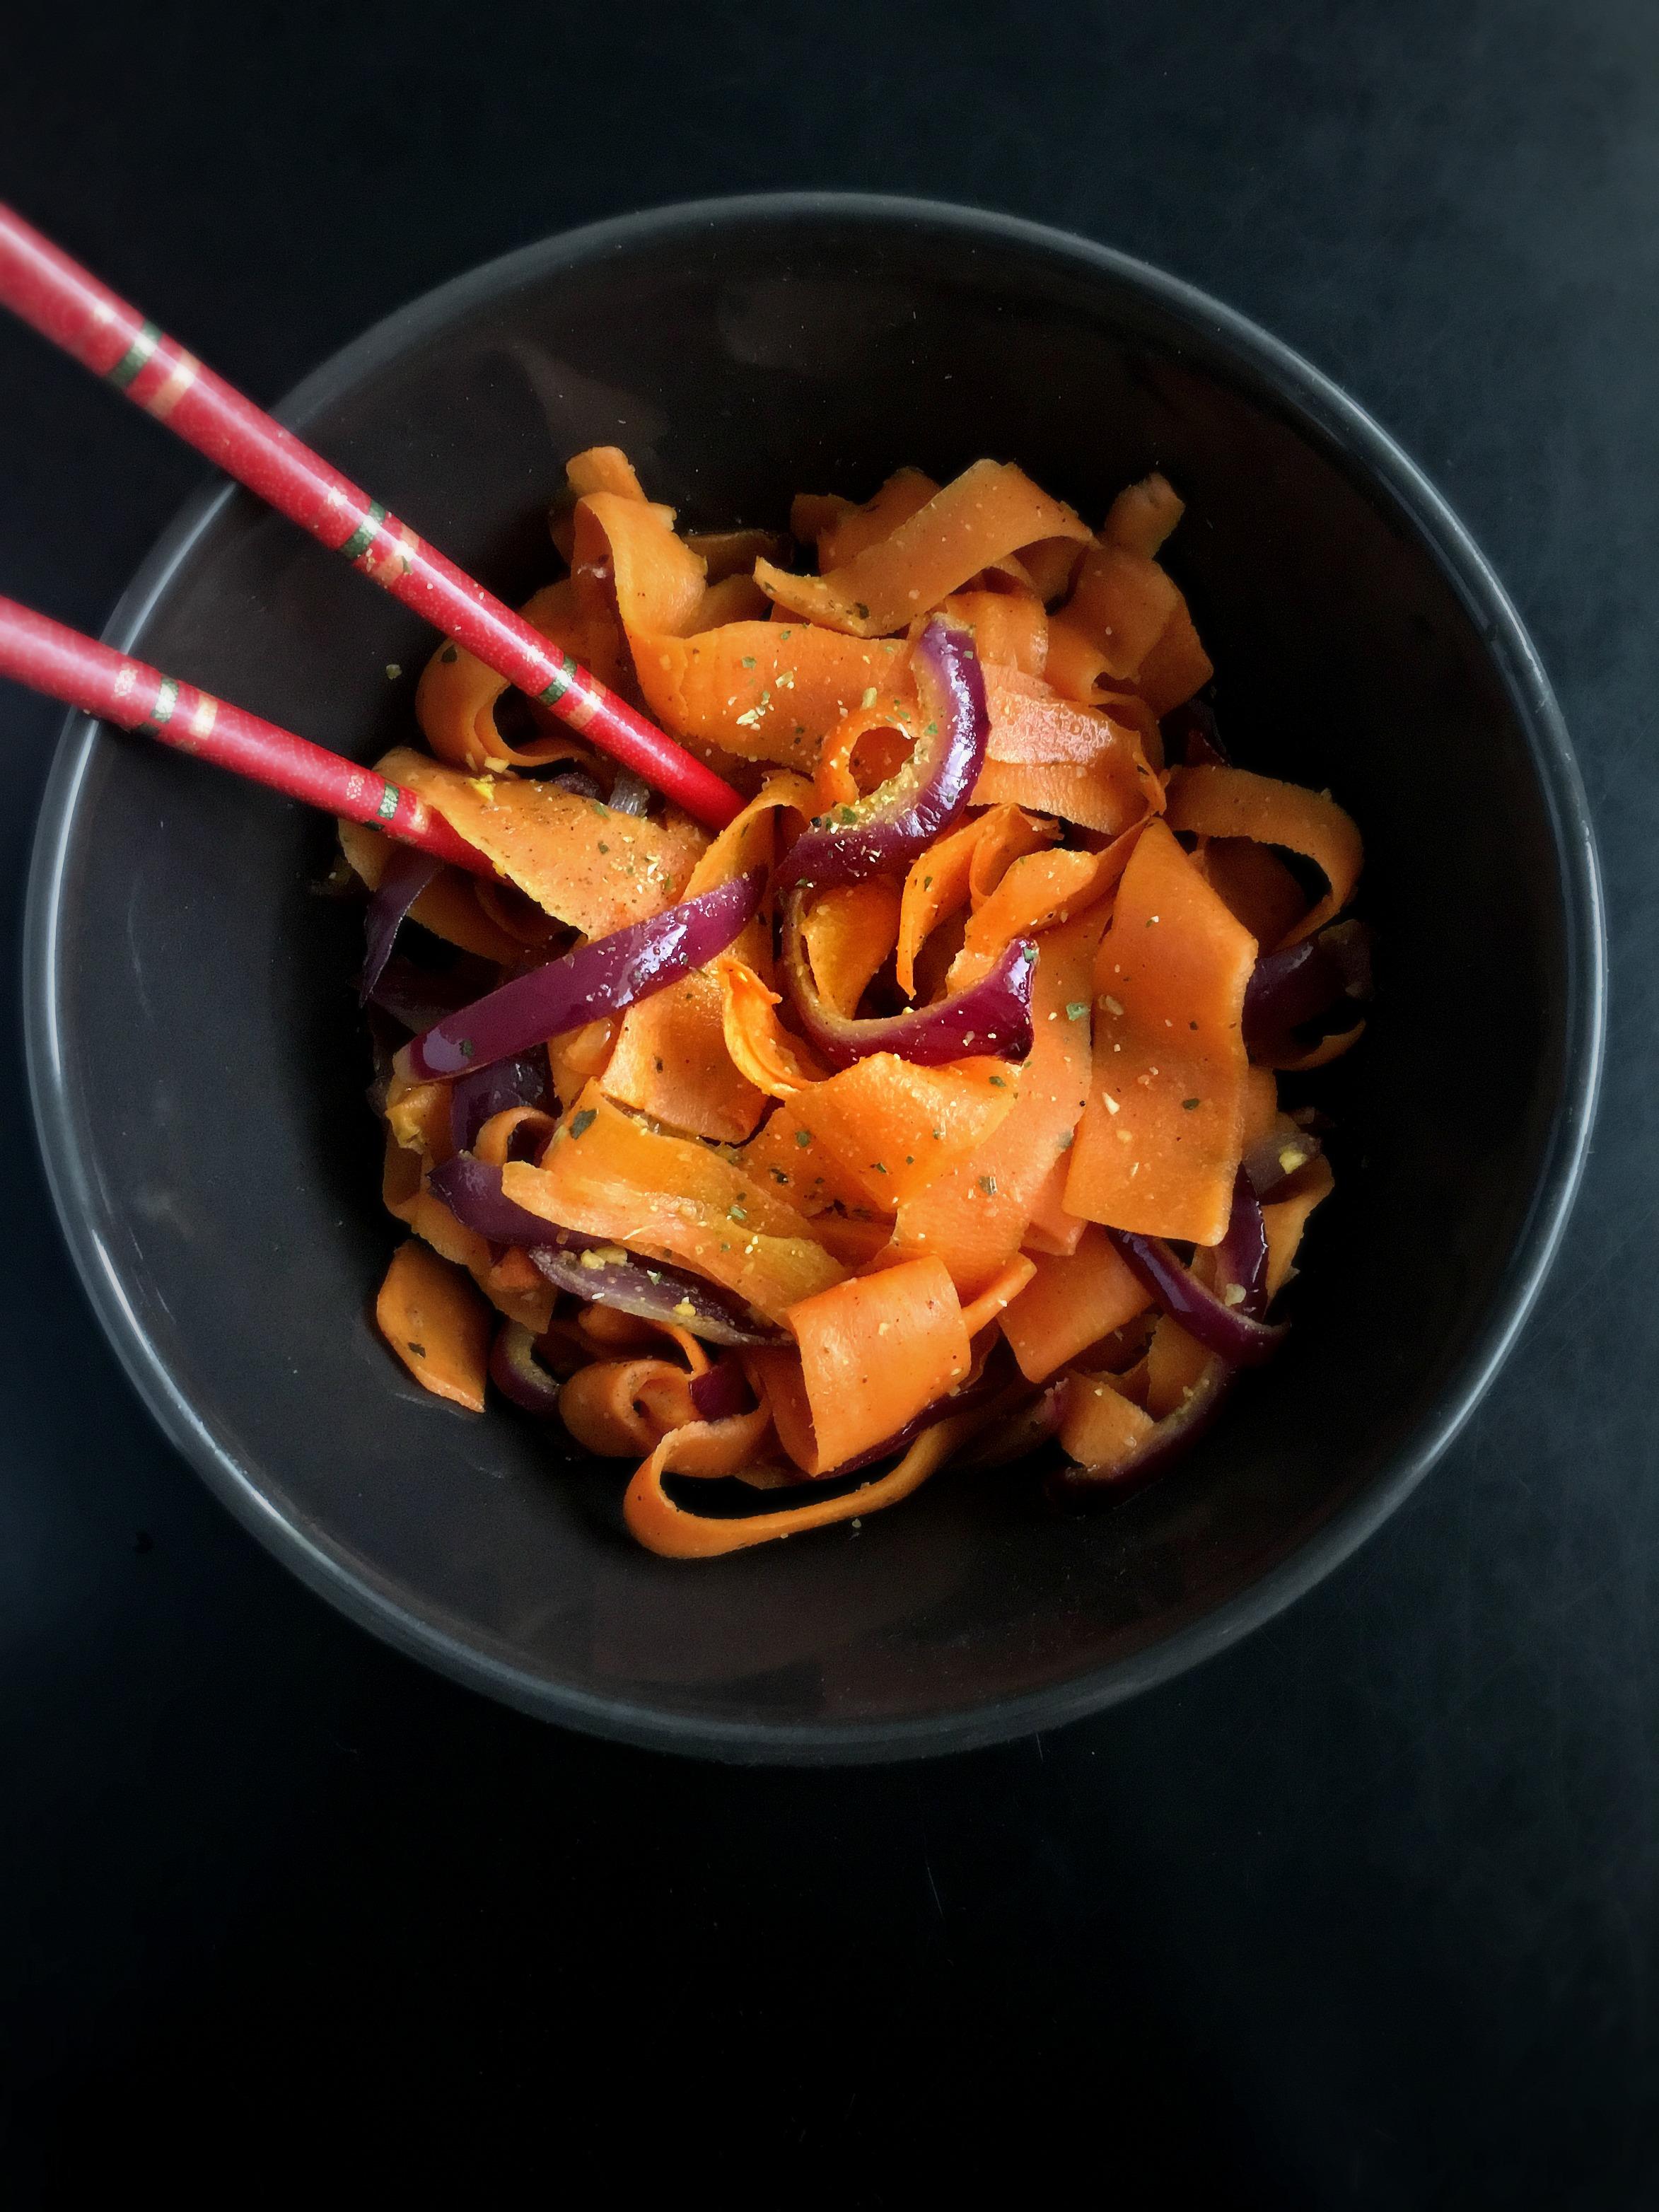 Vegan Black Pepper Carrot Onion Stir Fry | #vegan